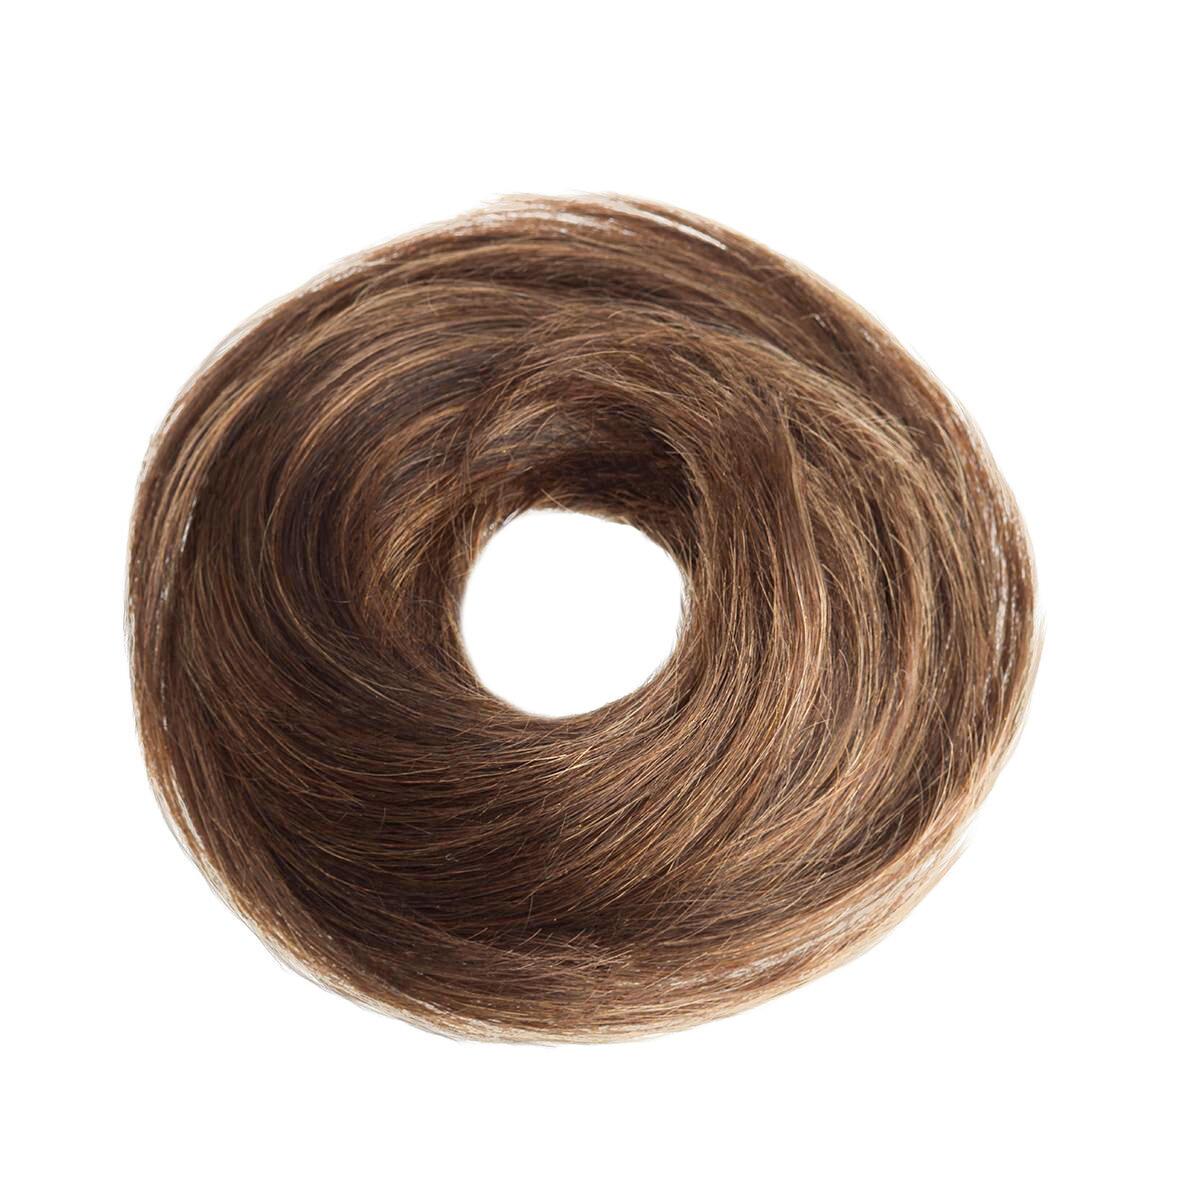 Volume Hair Scrunchie Original 40 g M2.3/5.0 Chocolate Mix 0 cm